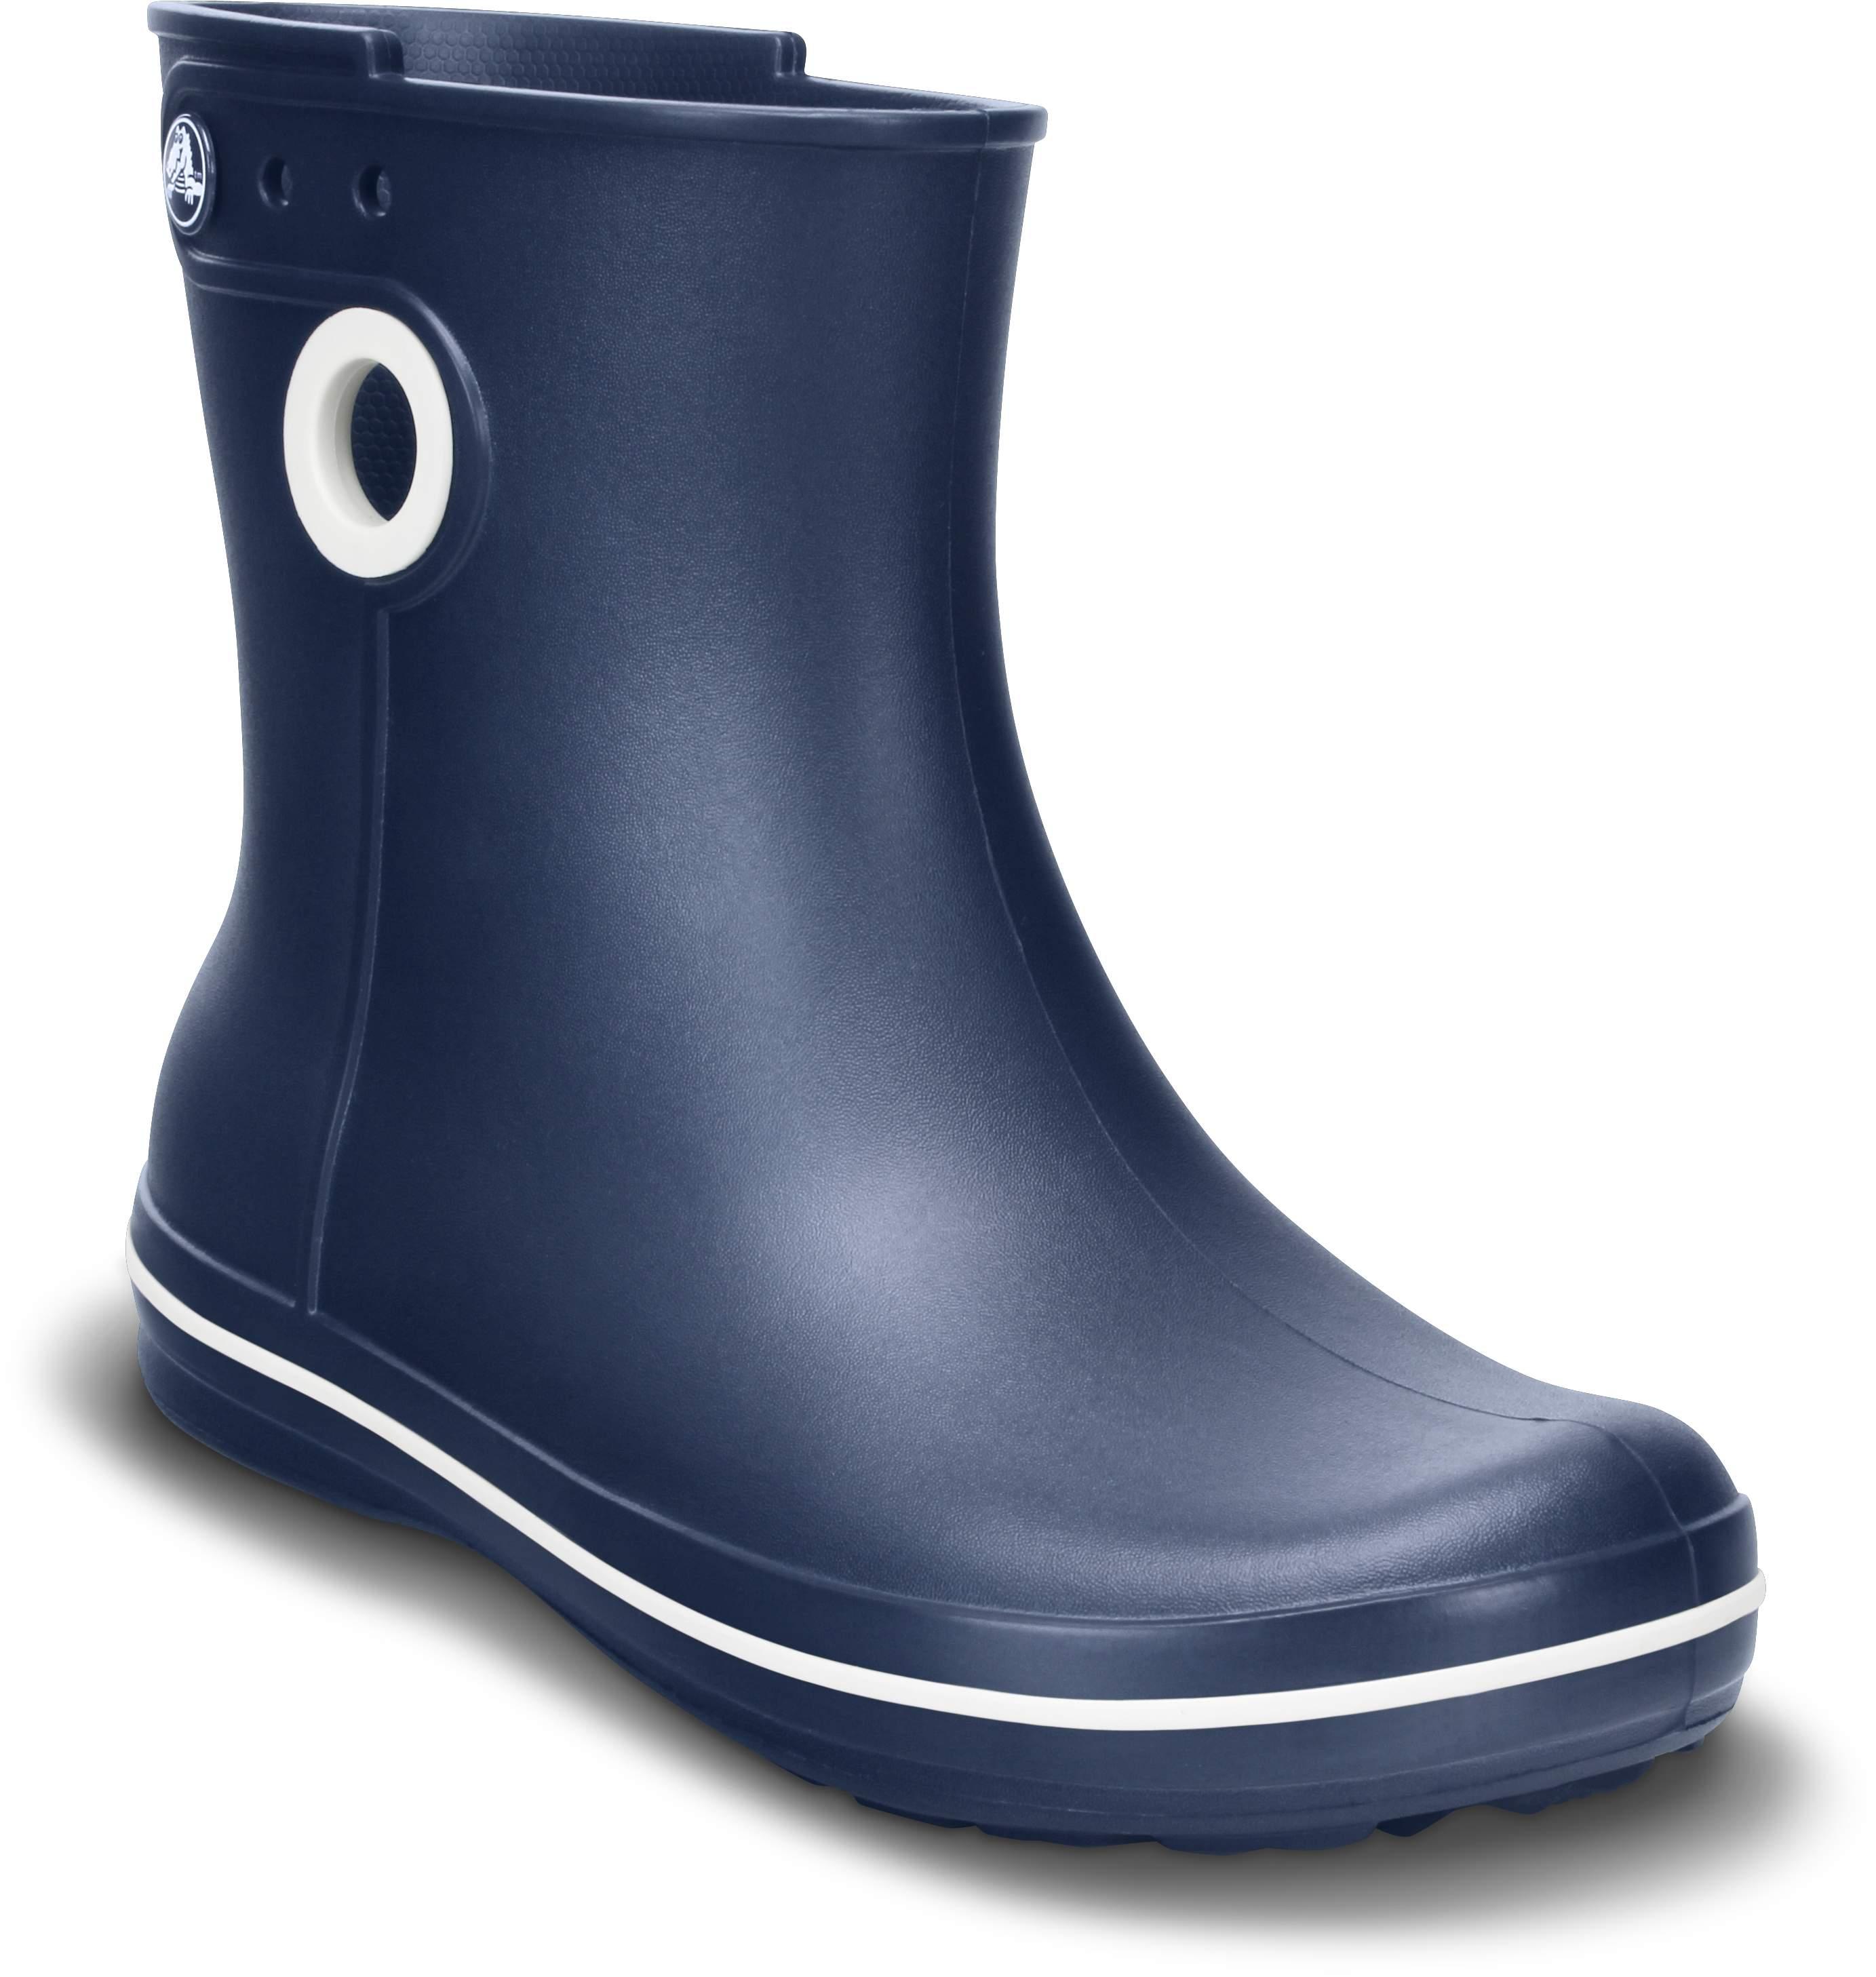 Crocs JAUNT - Bottes en caoutchouc bleu foncé